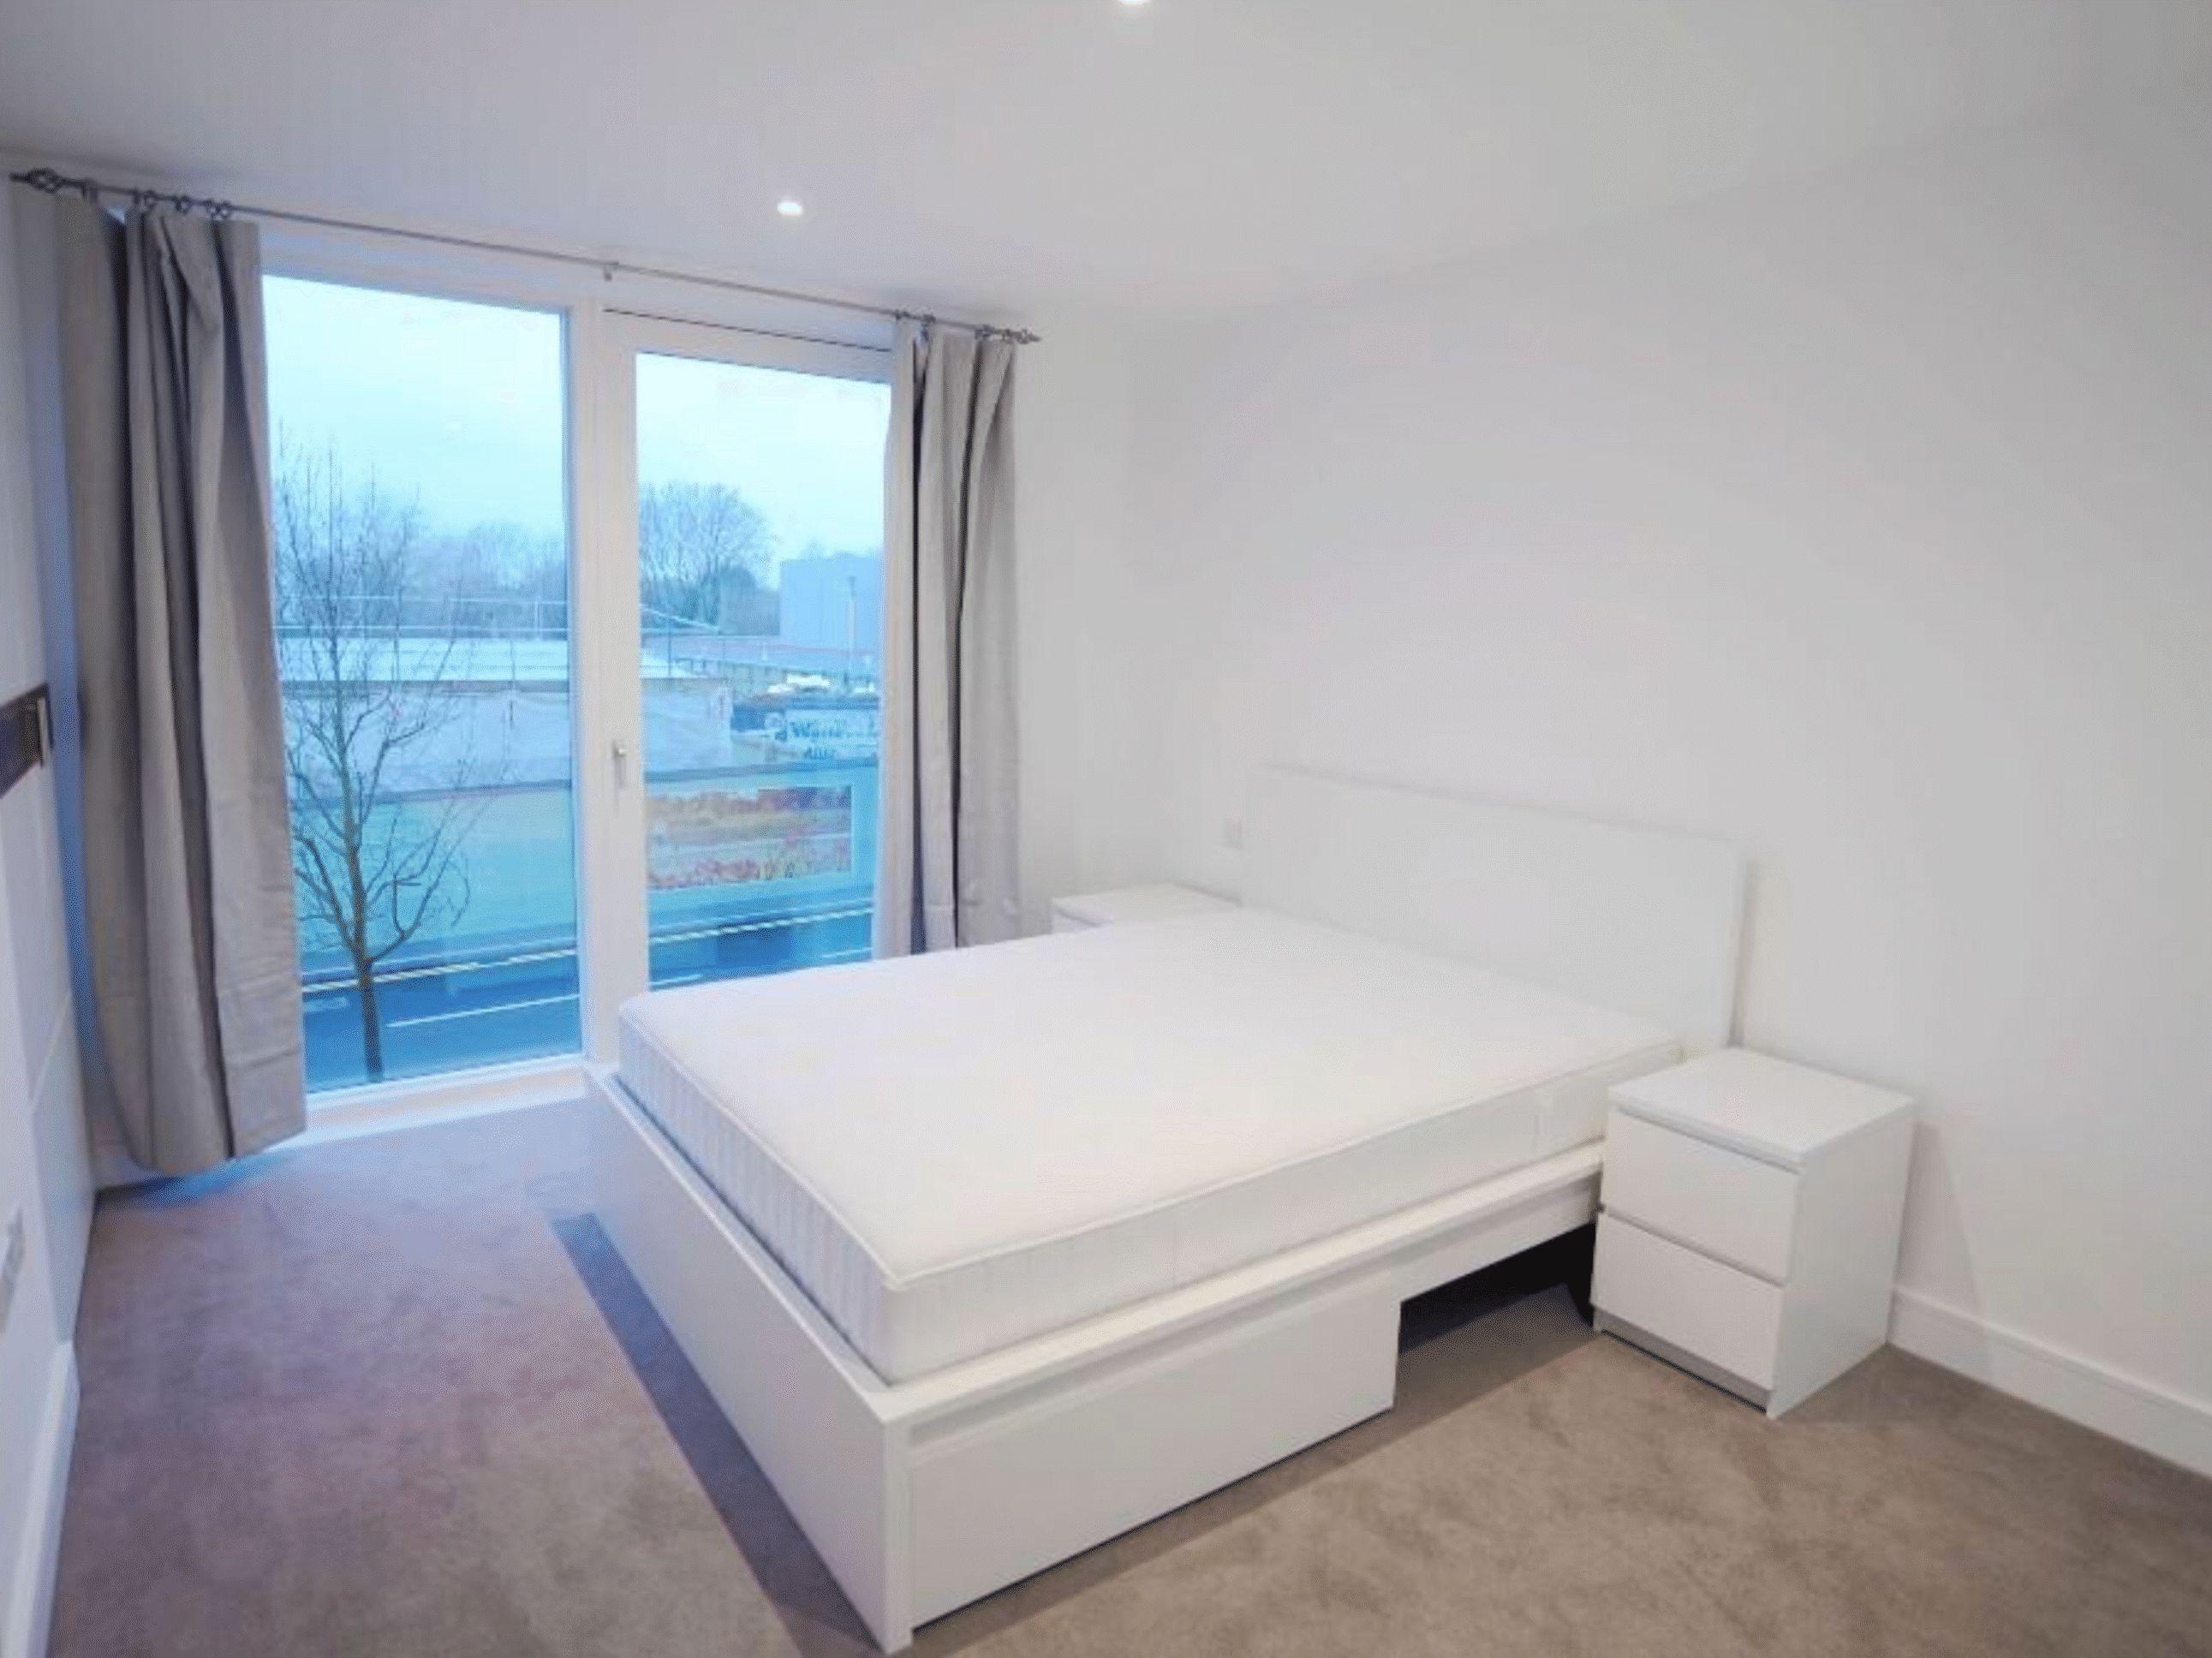 2 bed  to rent in Ebury Bridge Road  - Property Image 2